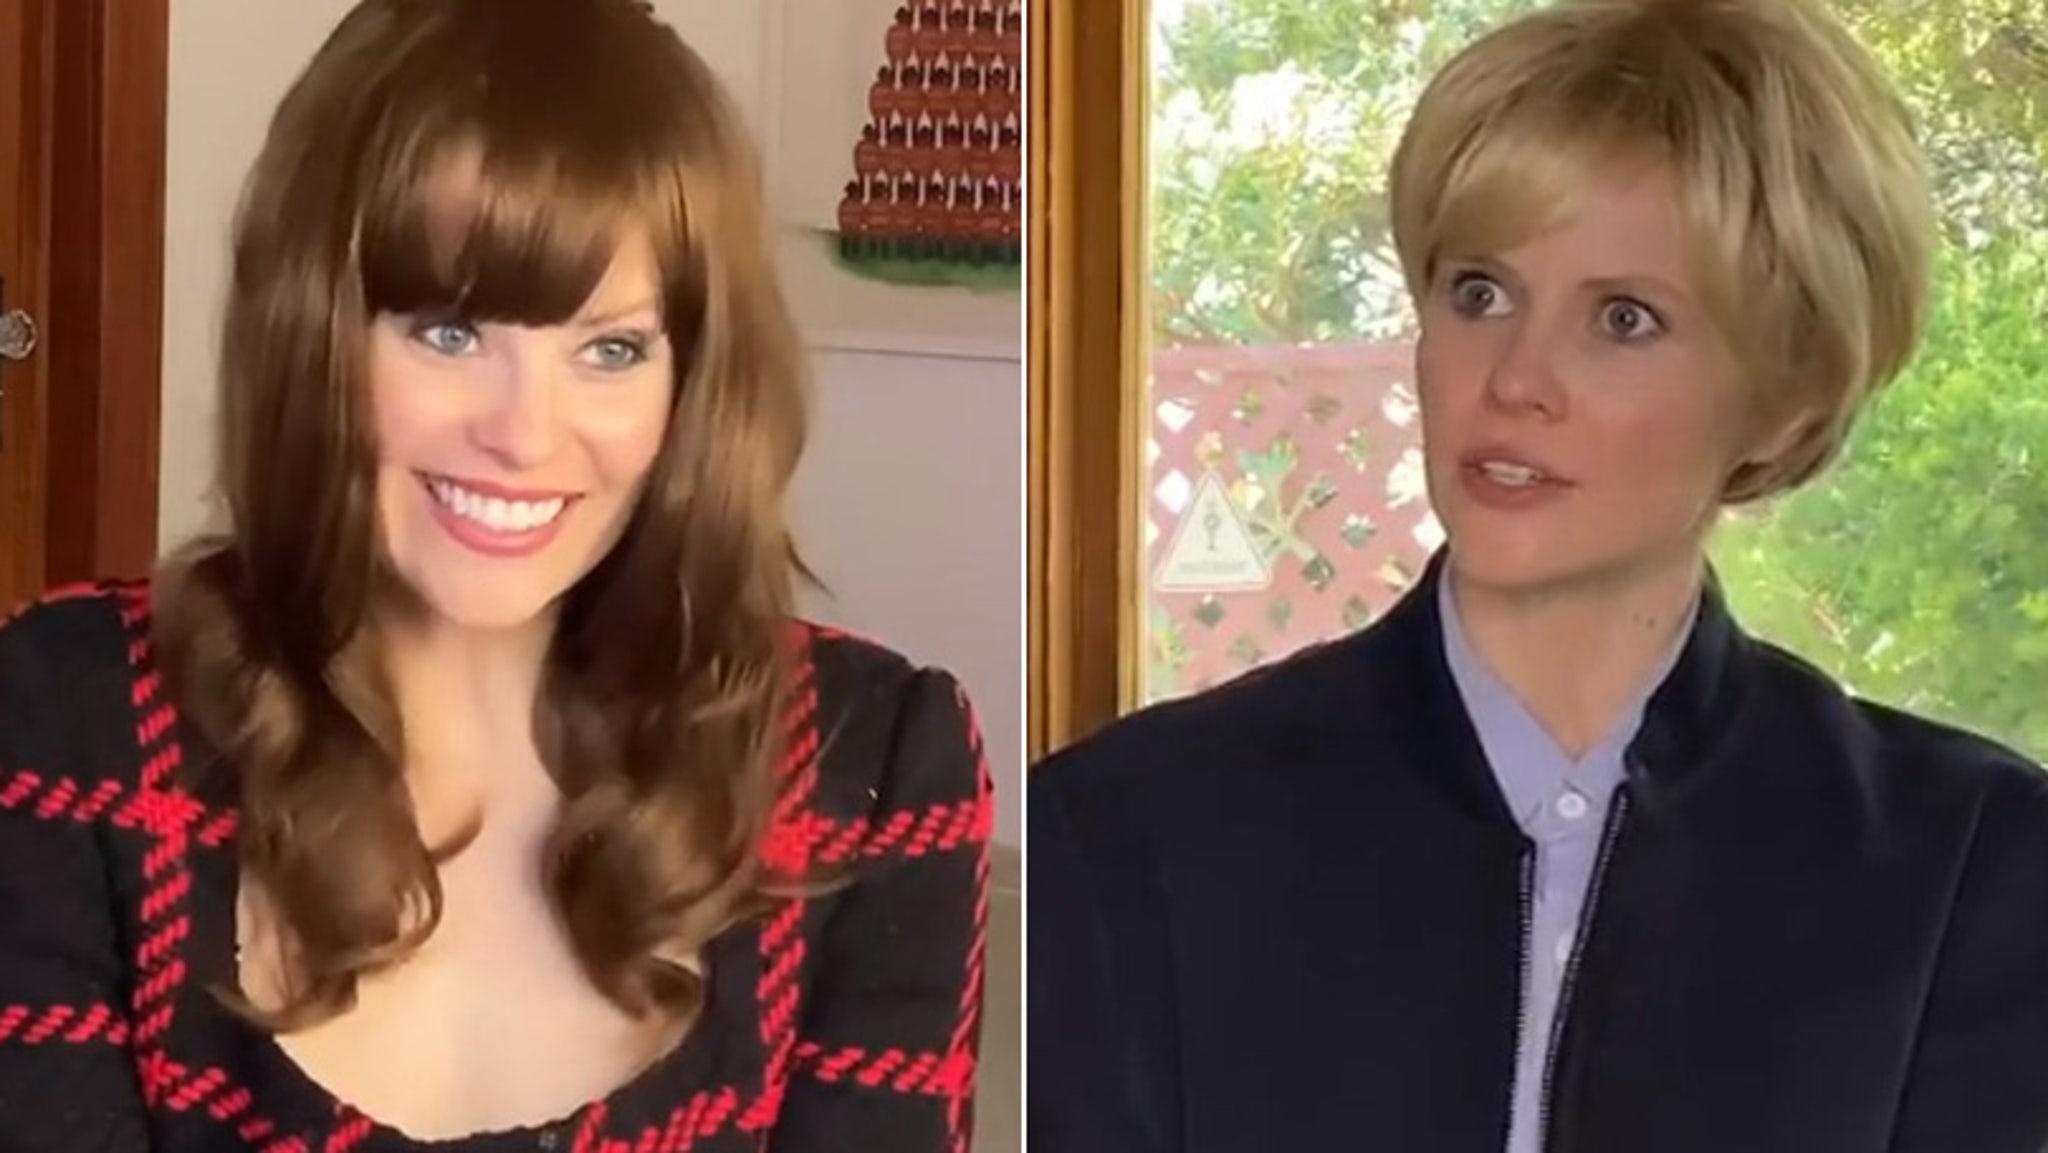 Parenthood Star Sarah Ramos Lovingly Recreates All the Cringe of That Dakota Johnson 'Ellen' Interview